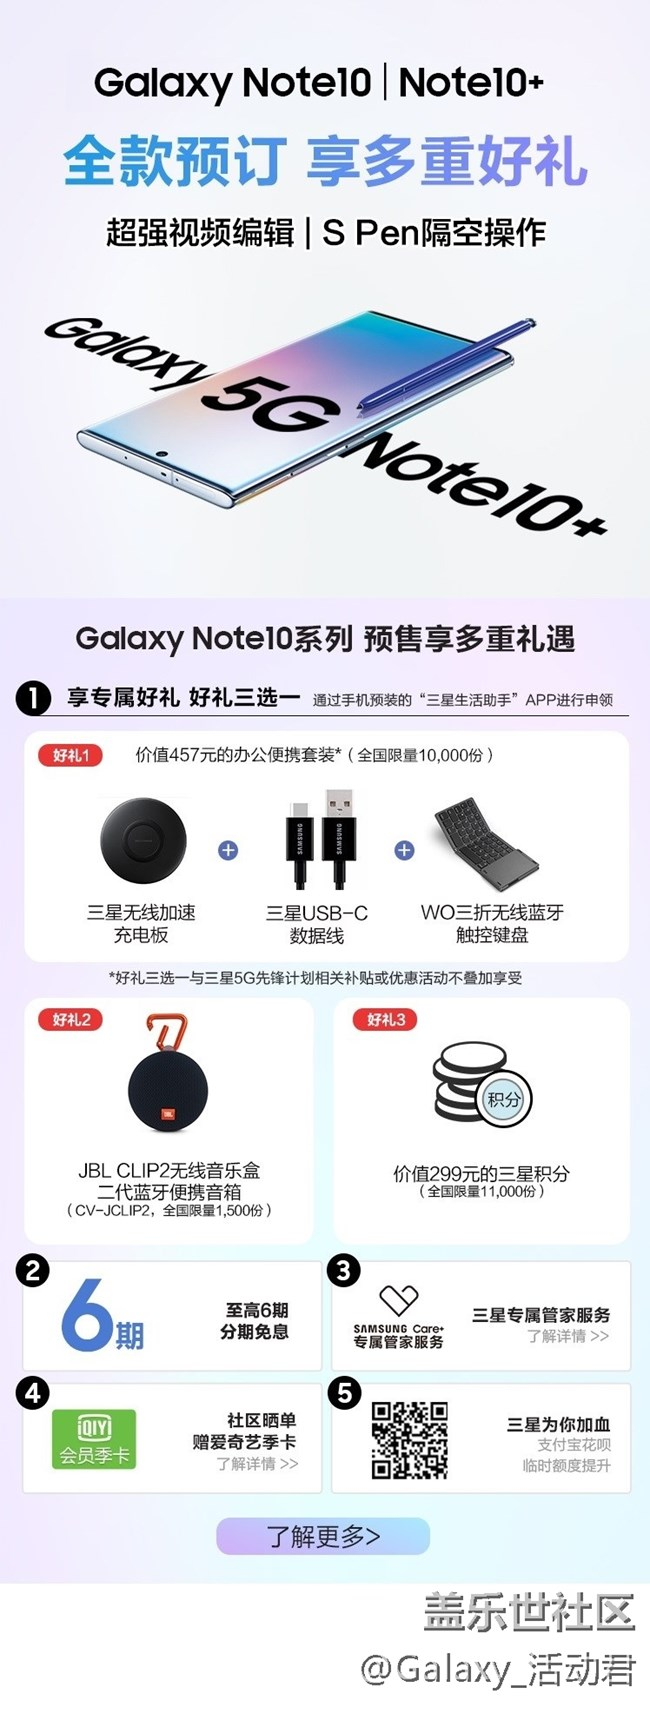 Galaxy Note10系列新品震撼上市,晒单拿爱奇艺VIP黄金季卡!